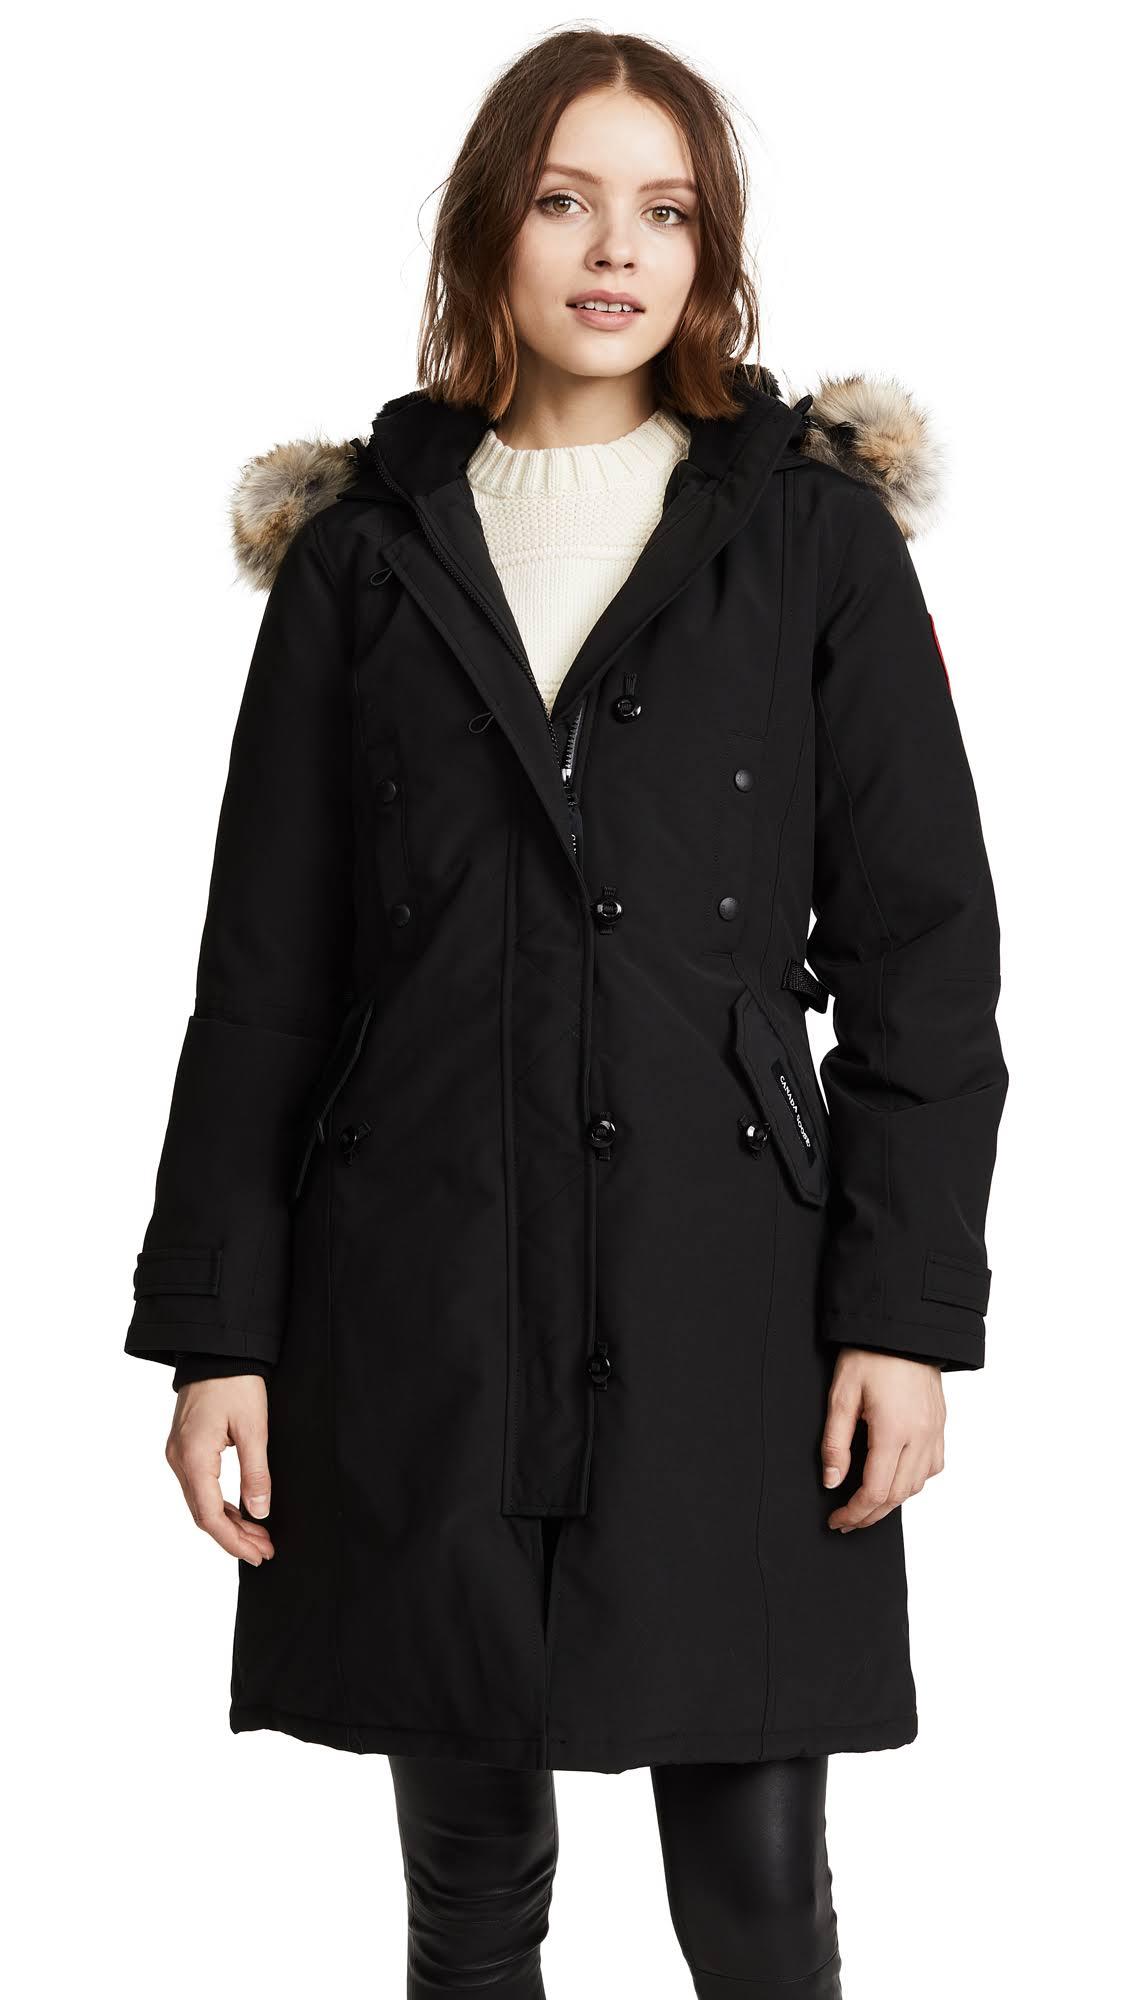 Para Mujer Kensington Slim Fit Canada Negro Goose Parka 177tfnIa